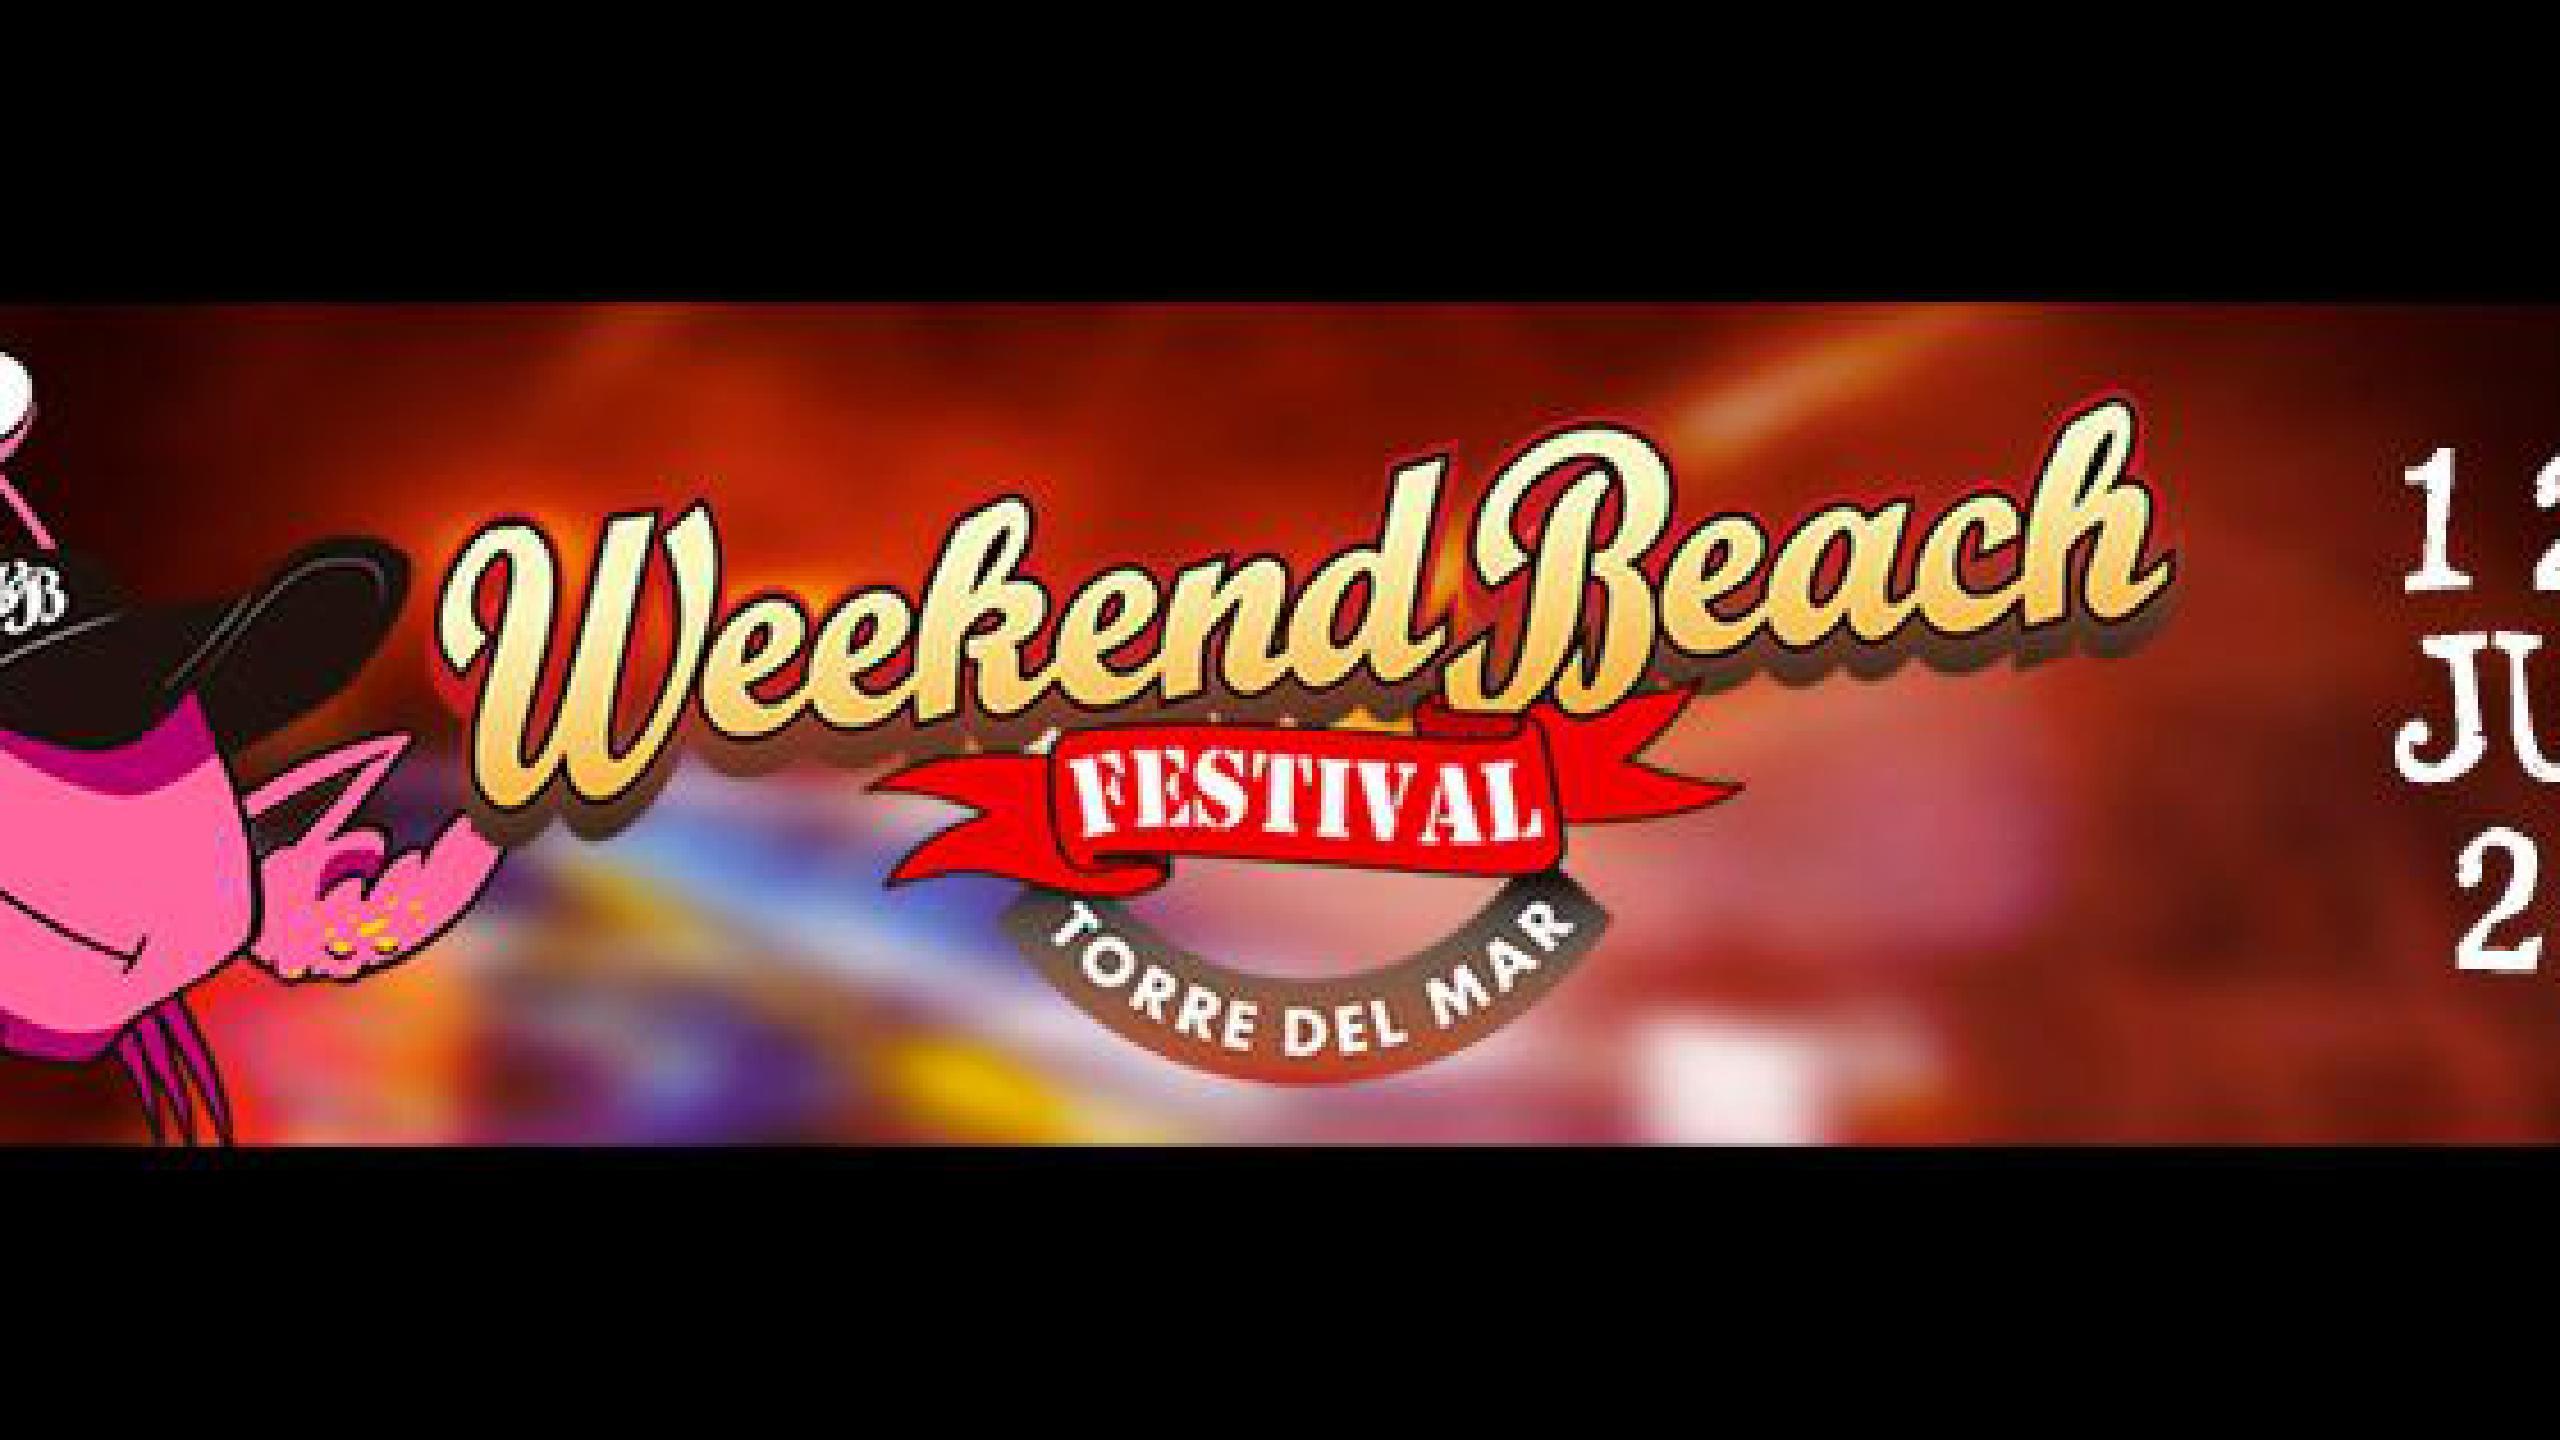 Weekend Beach 2022